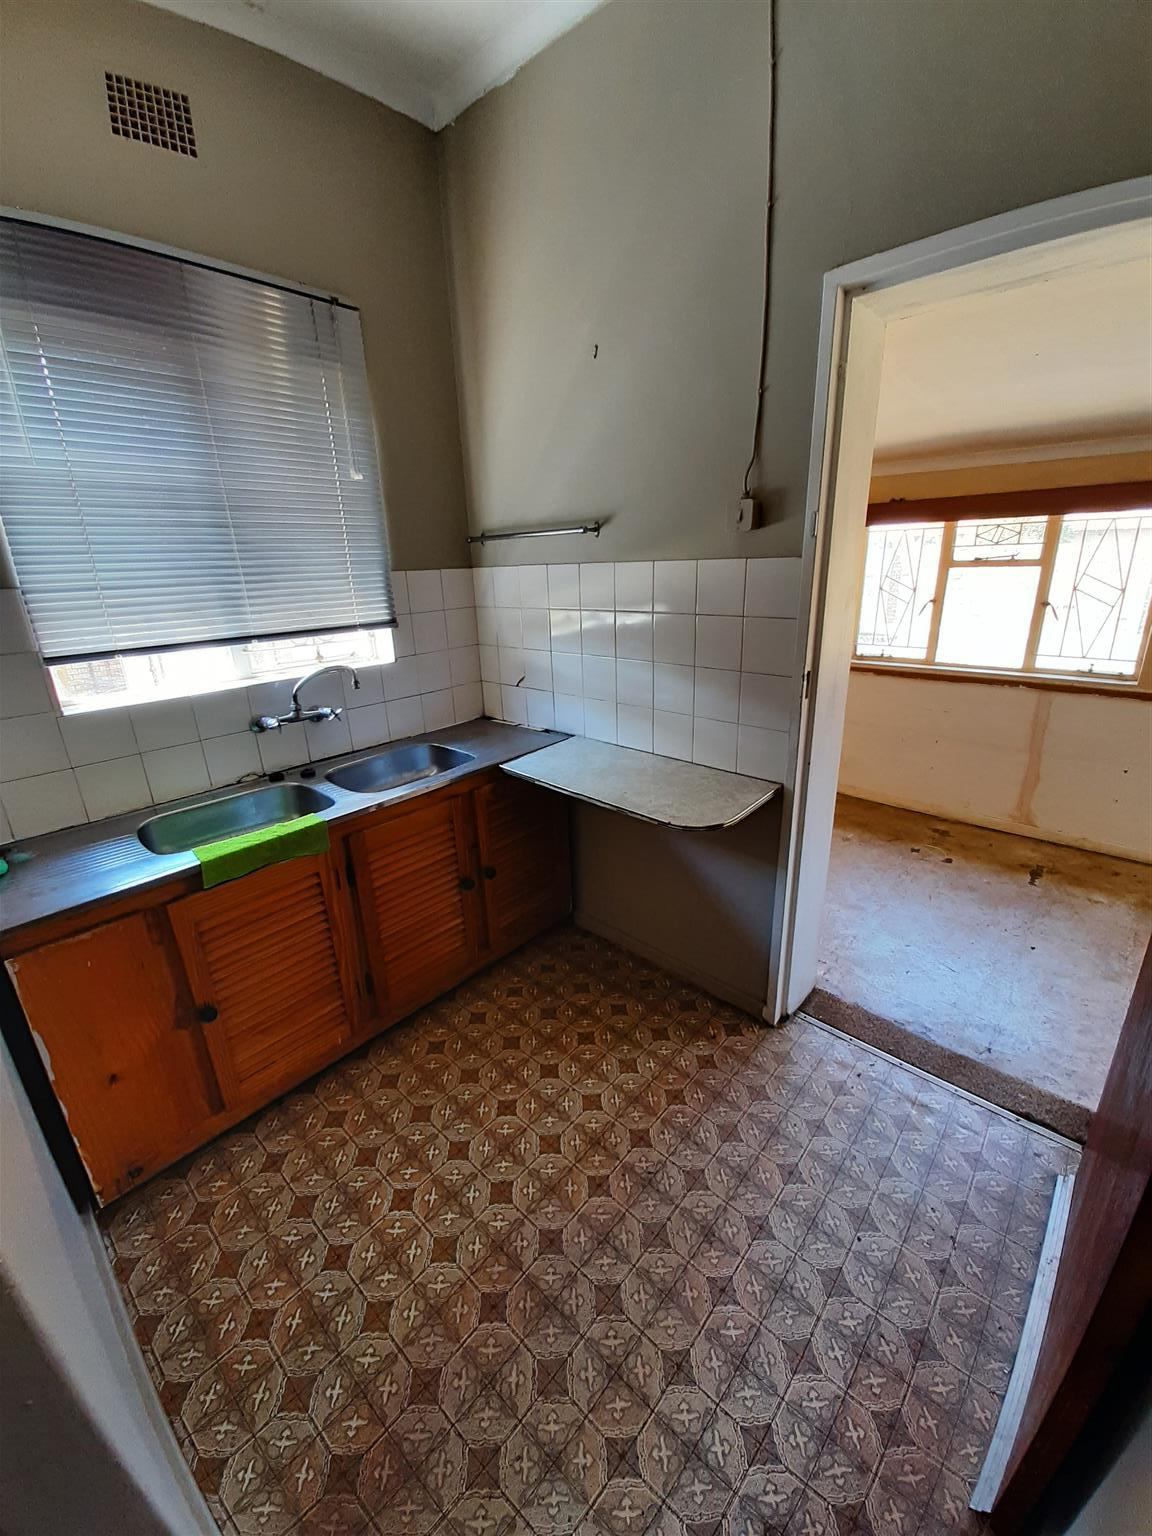 Leeudoringstad 3 bedroom house for sale